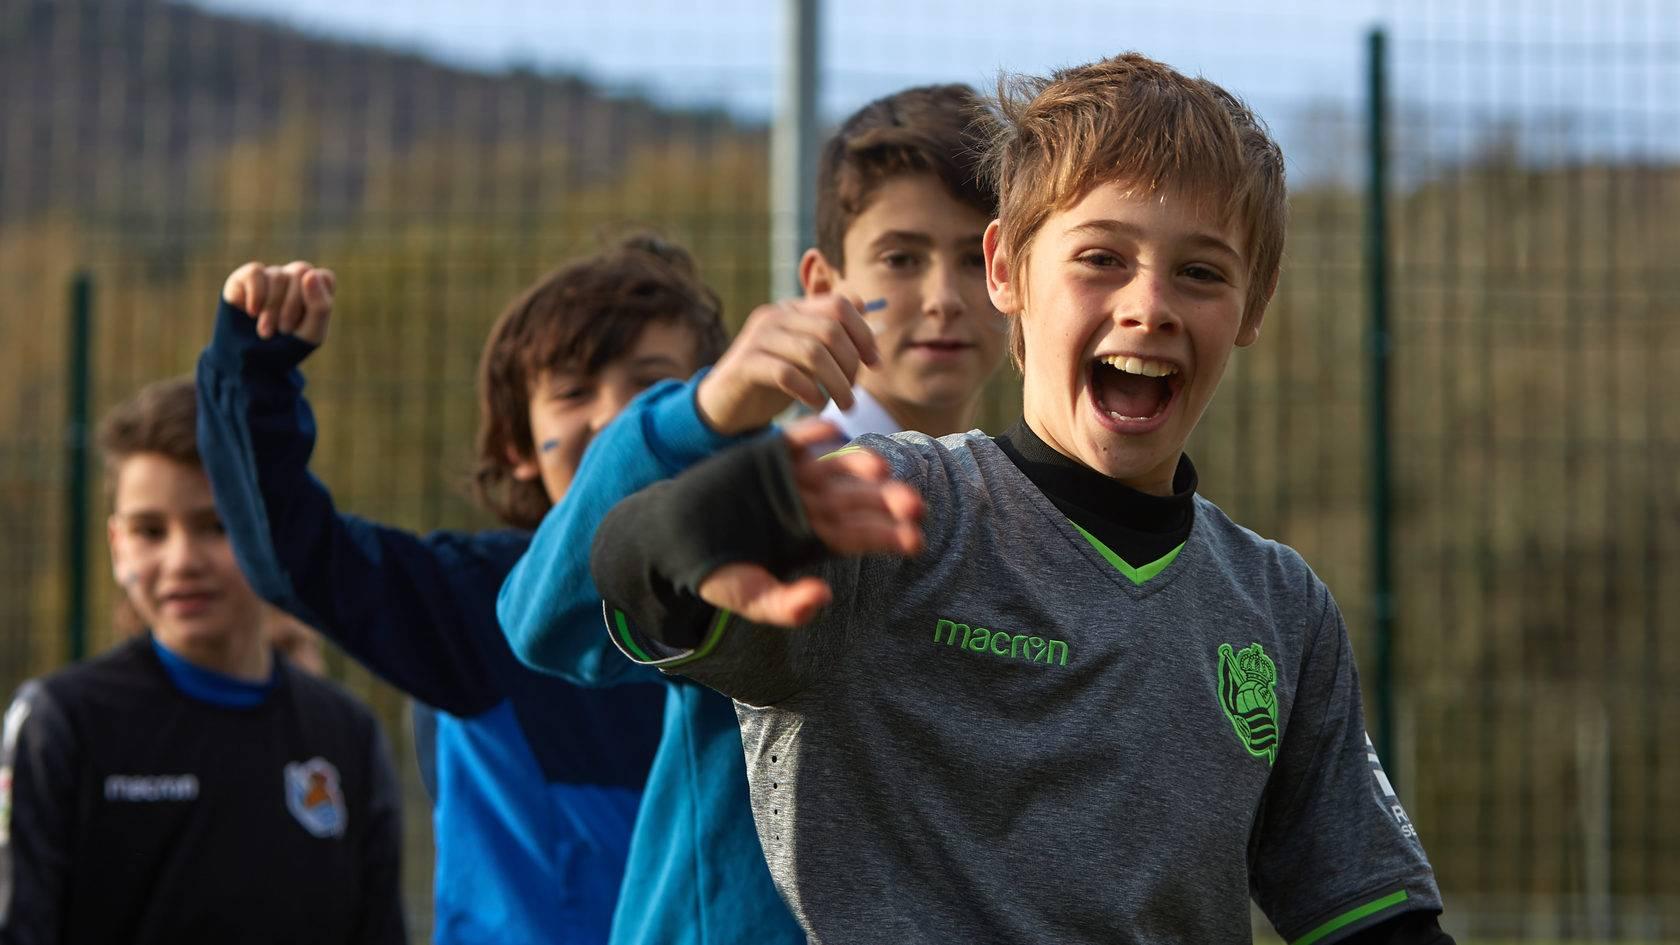 Стань профессионалом в академии spanish pro football – валенсия, испания. испания по-русски - все о жизни в испании